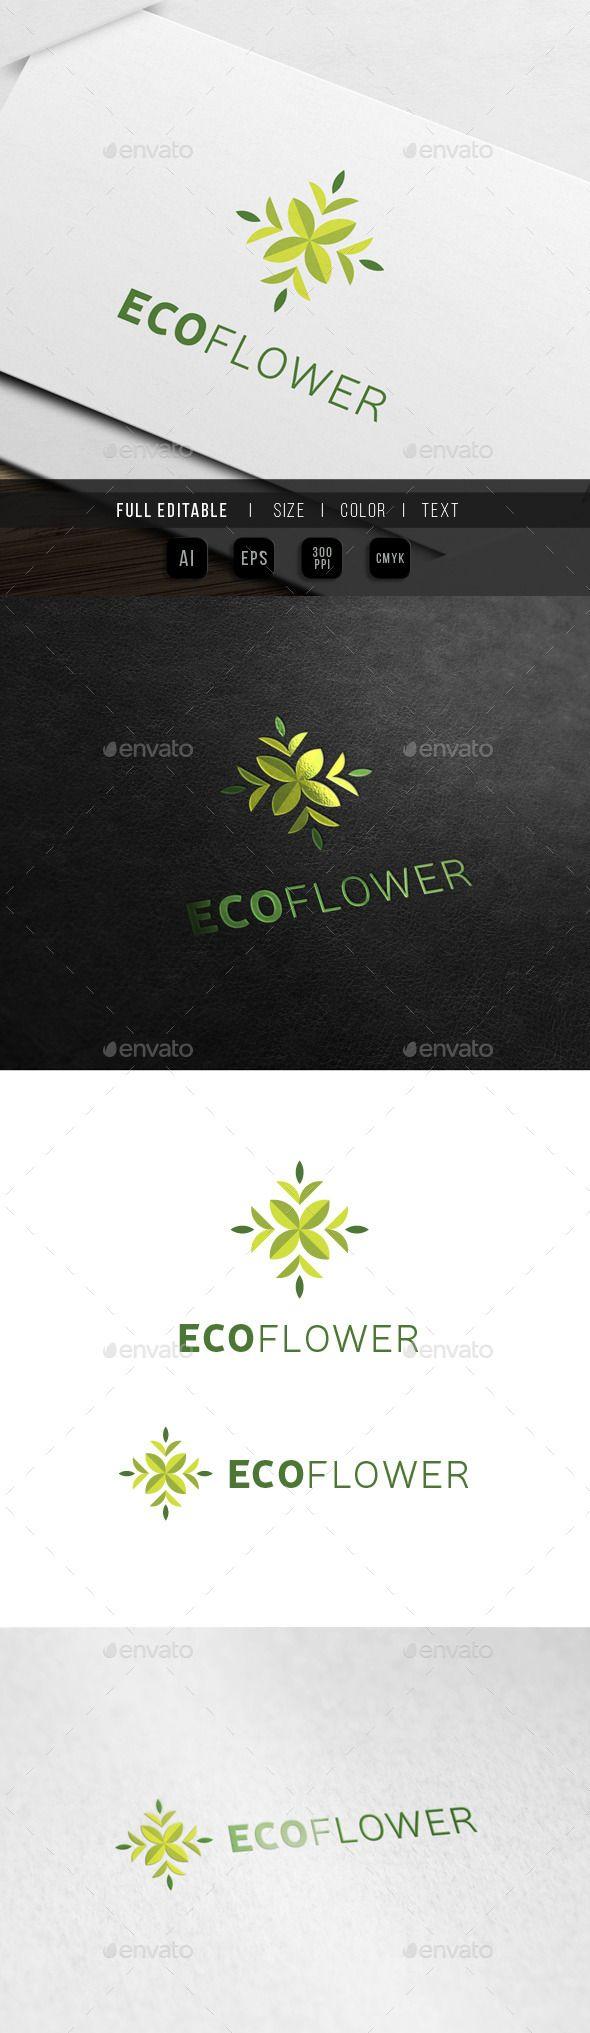 Eco Flower Floral Art Eco Flower Logo Templates And Art Logo